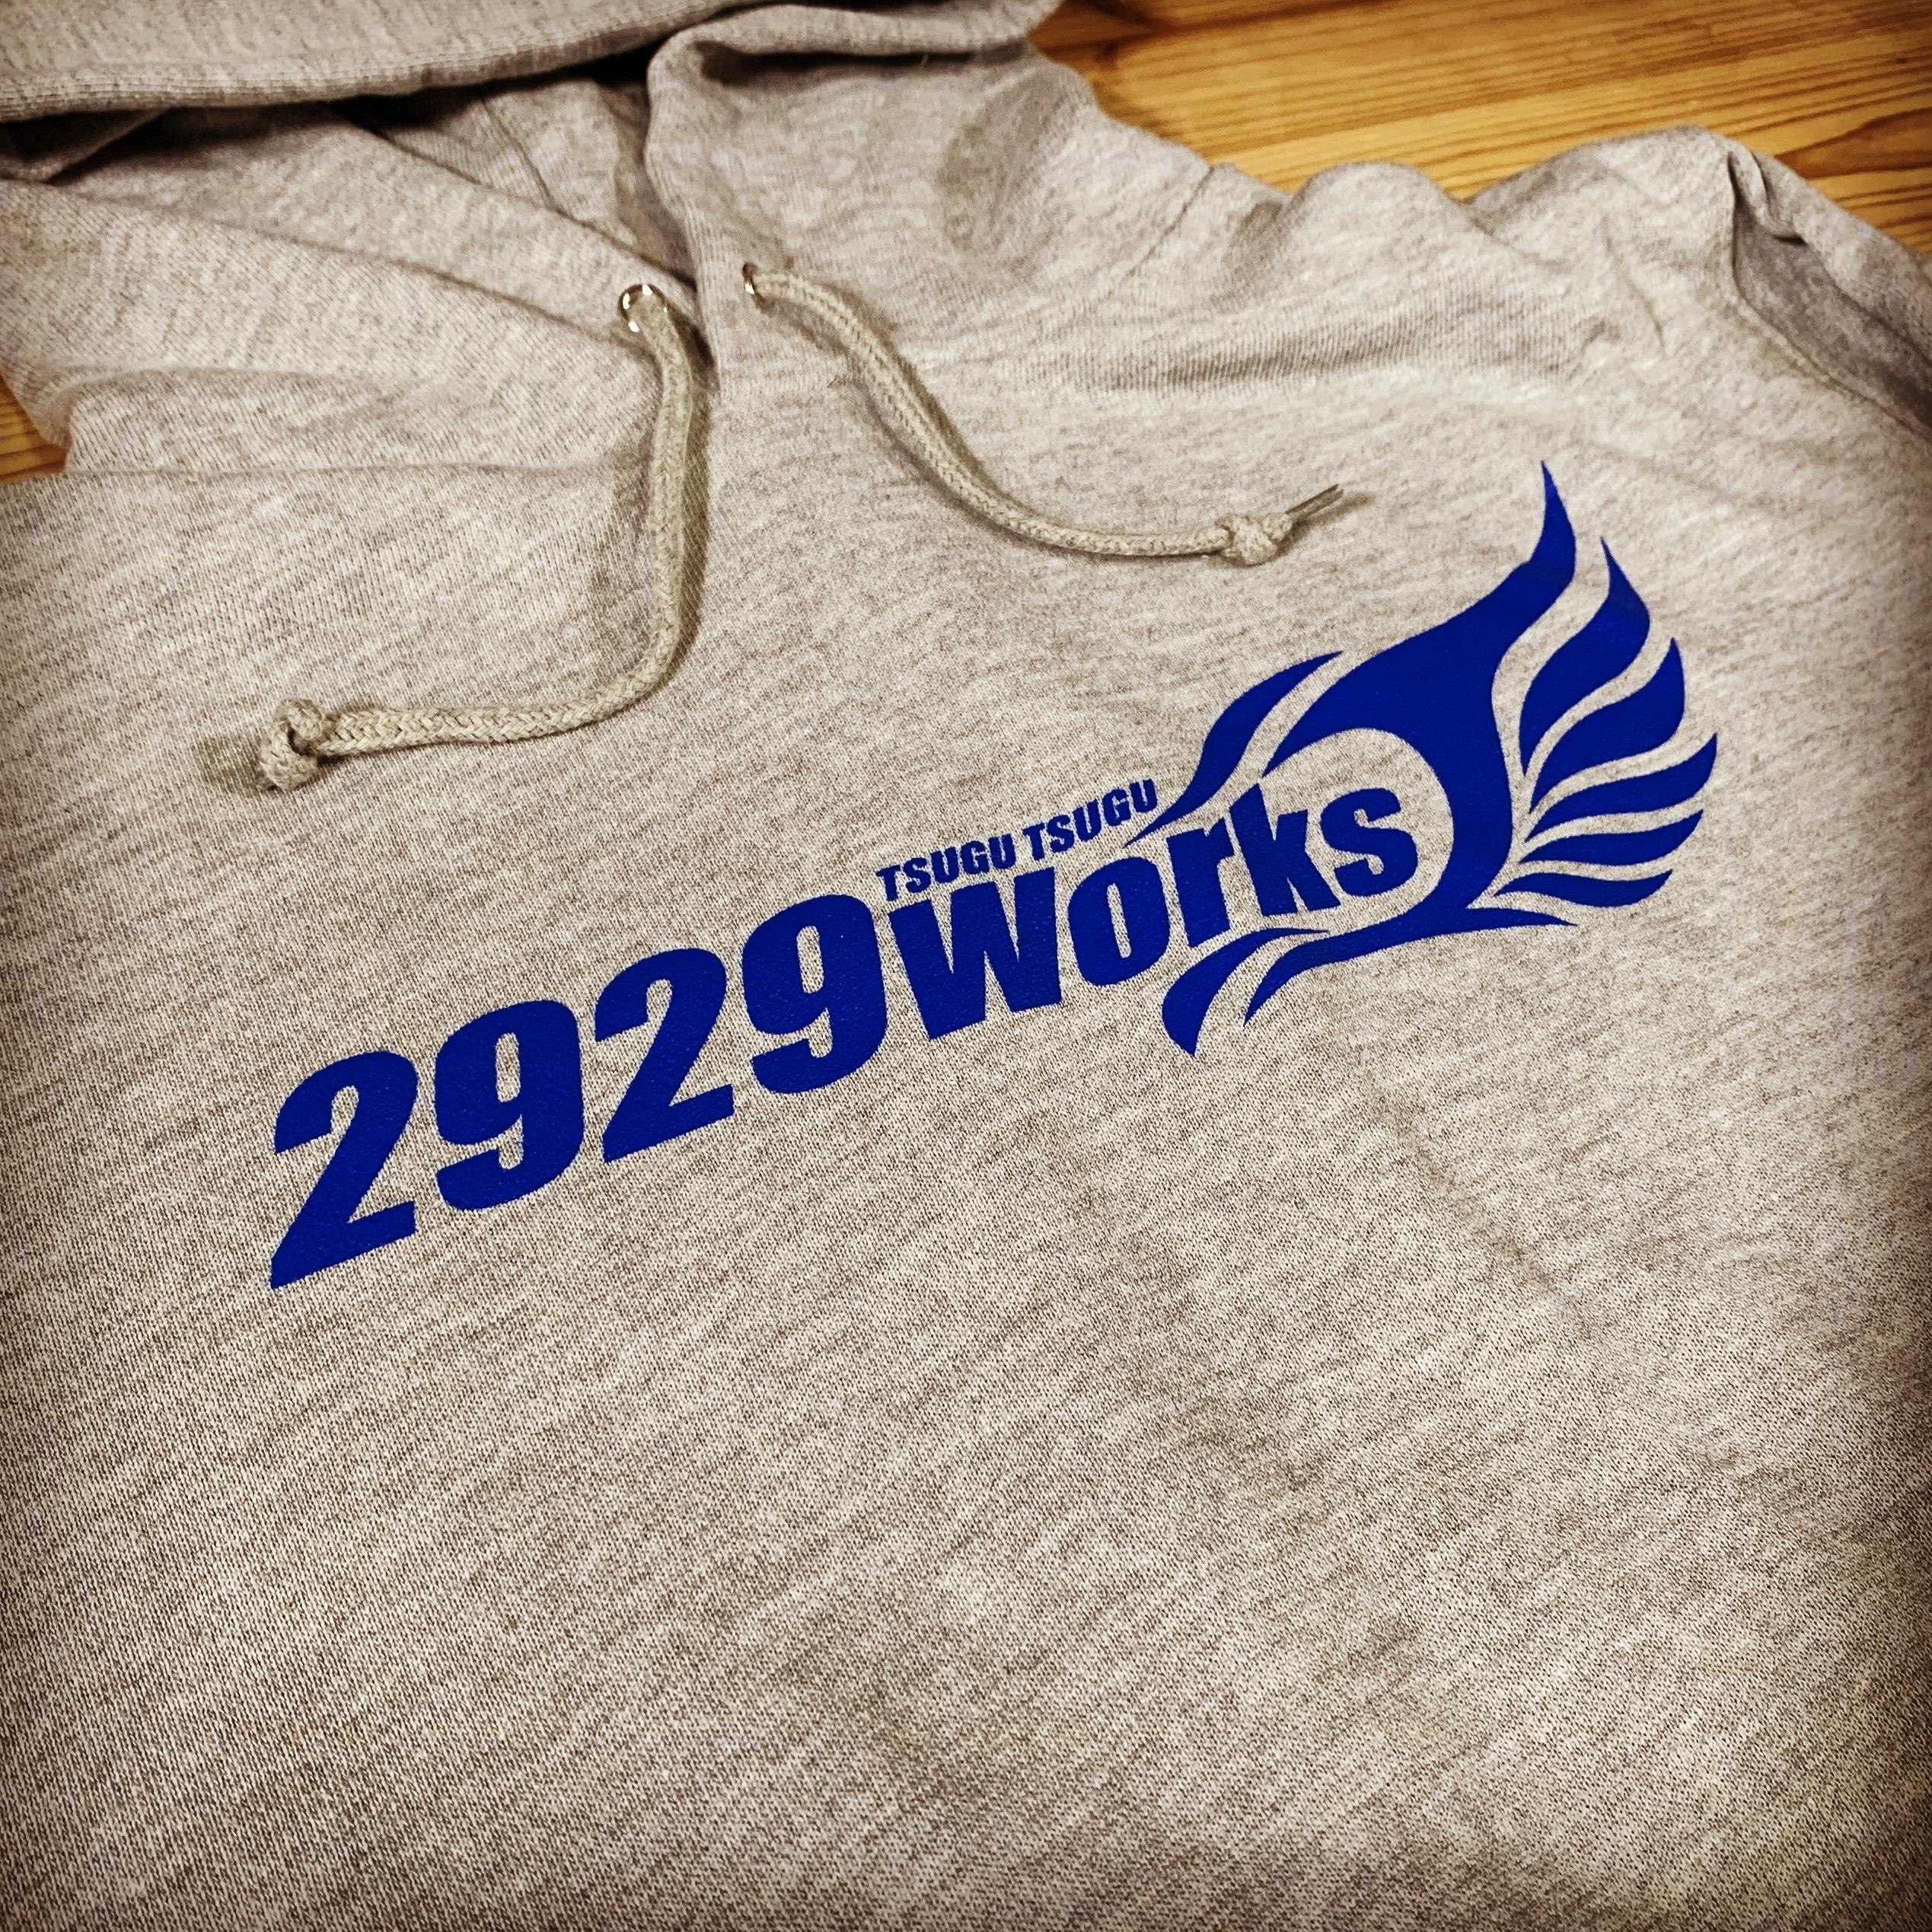 2929works